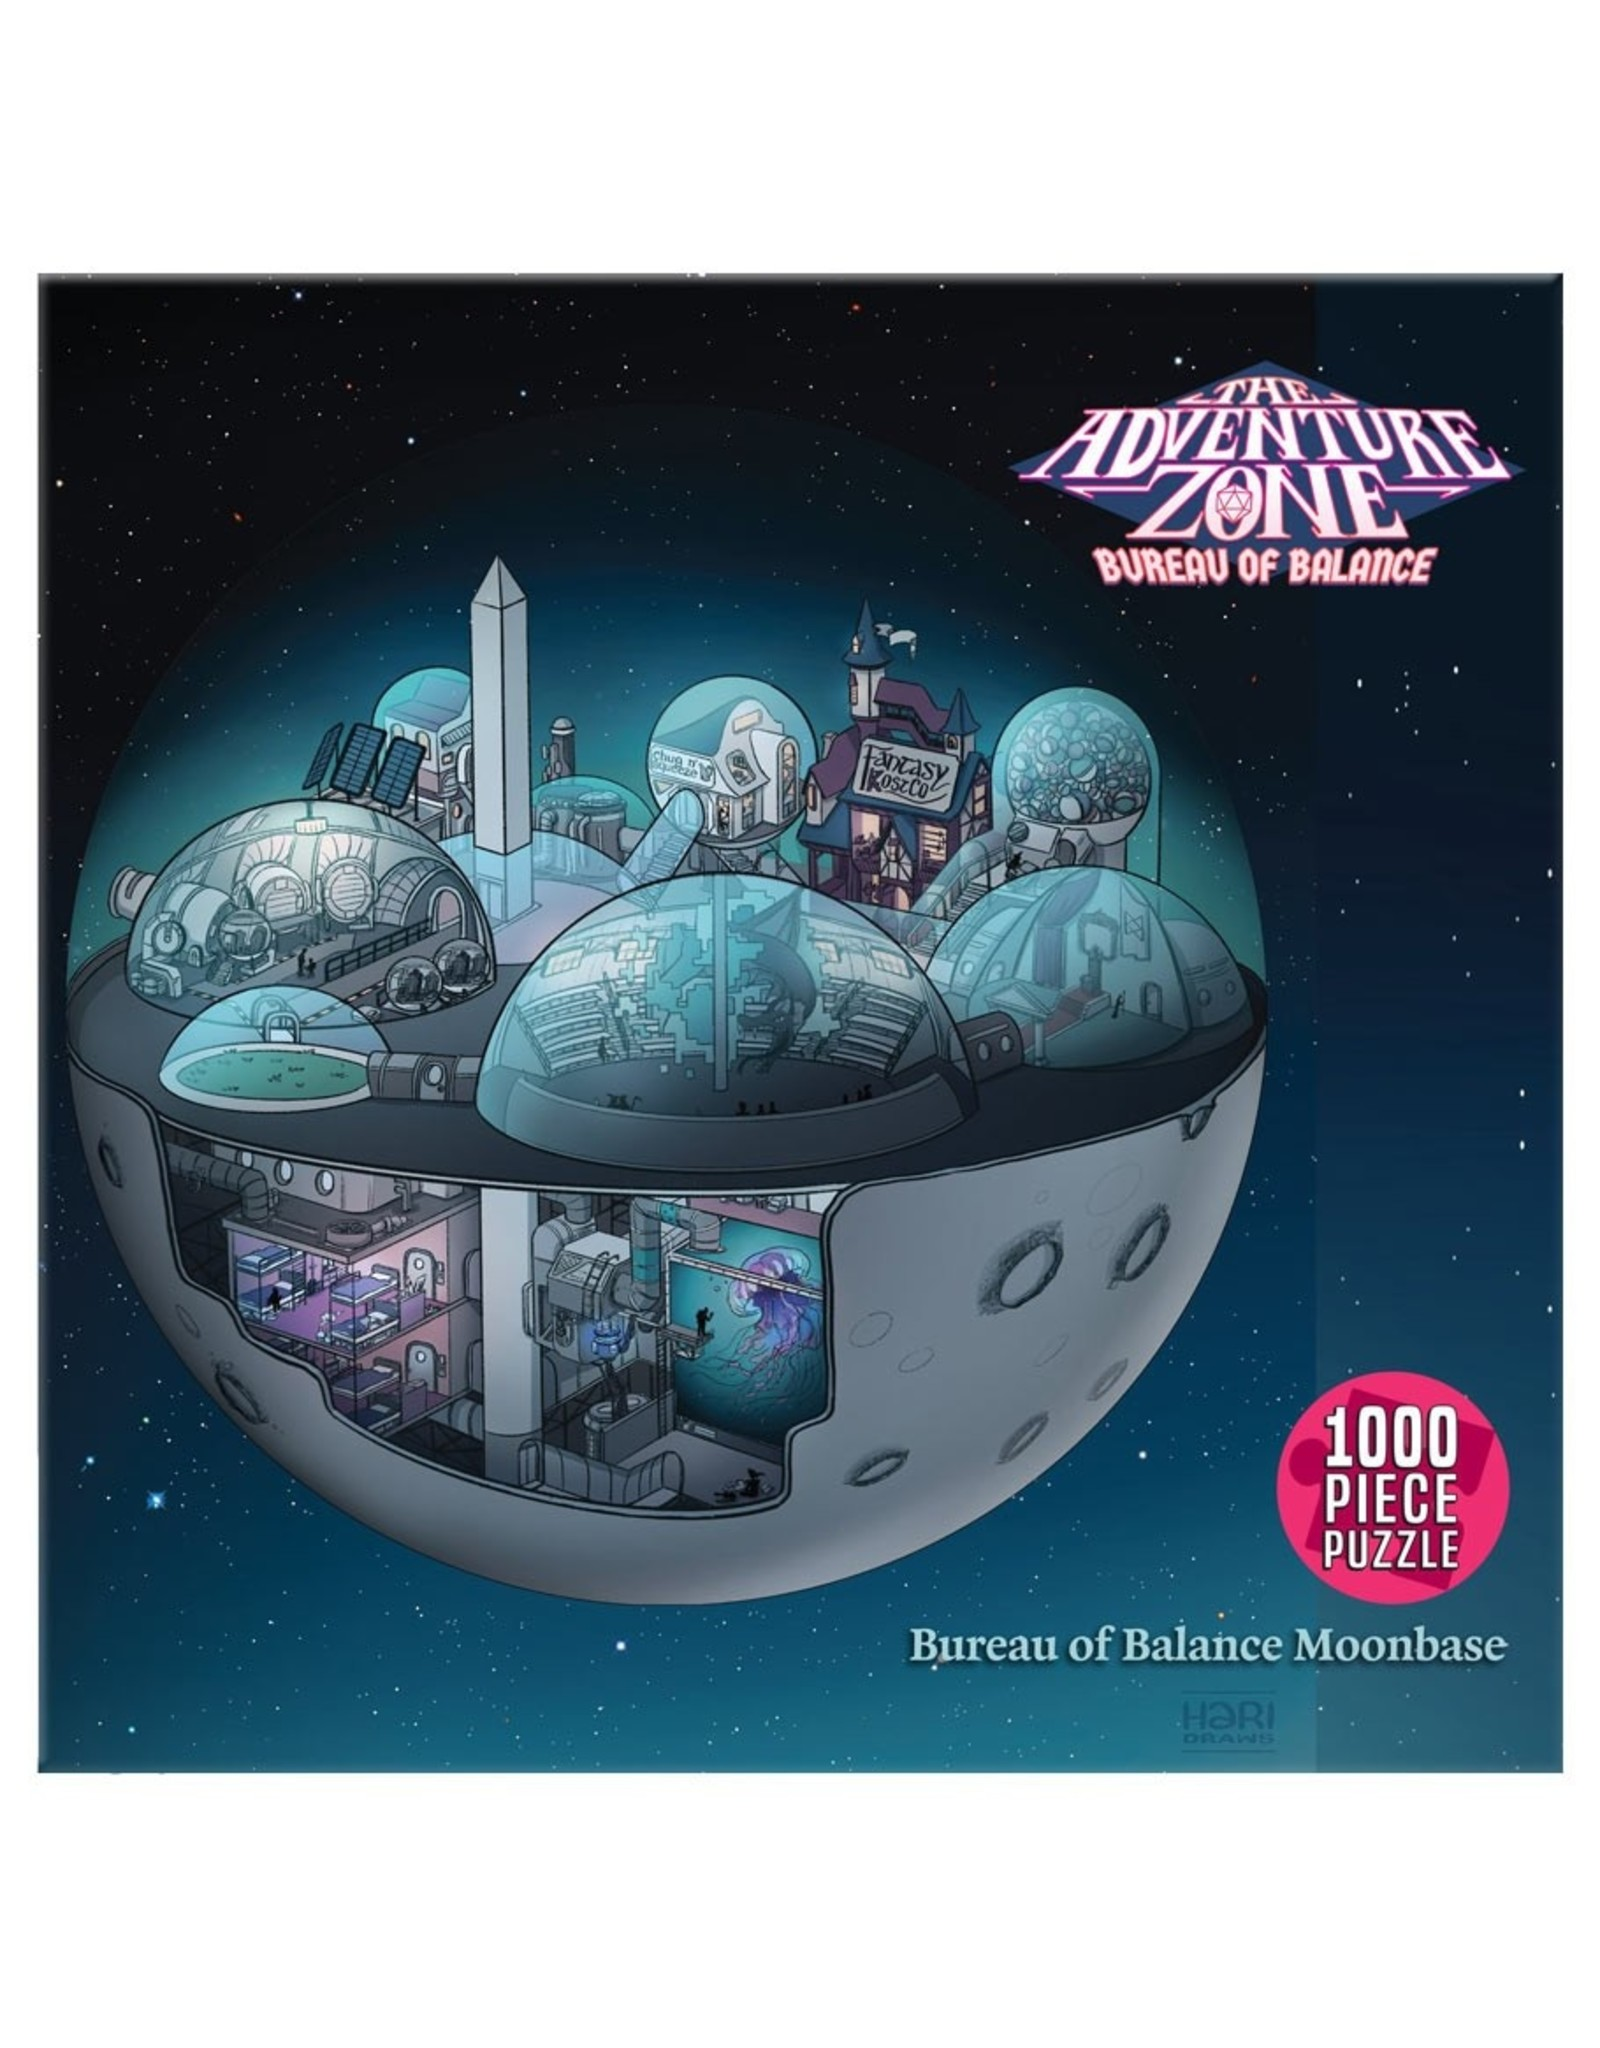 Puzzle - The Adventure Zone